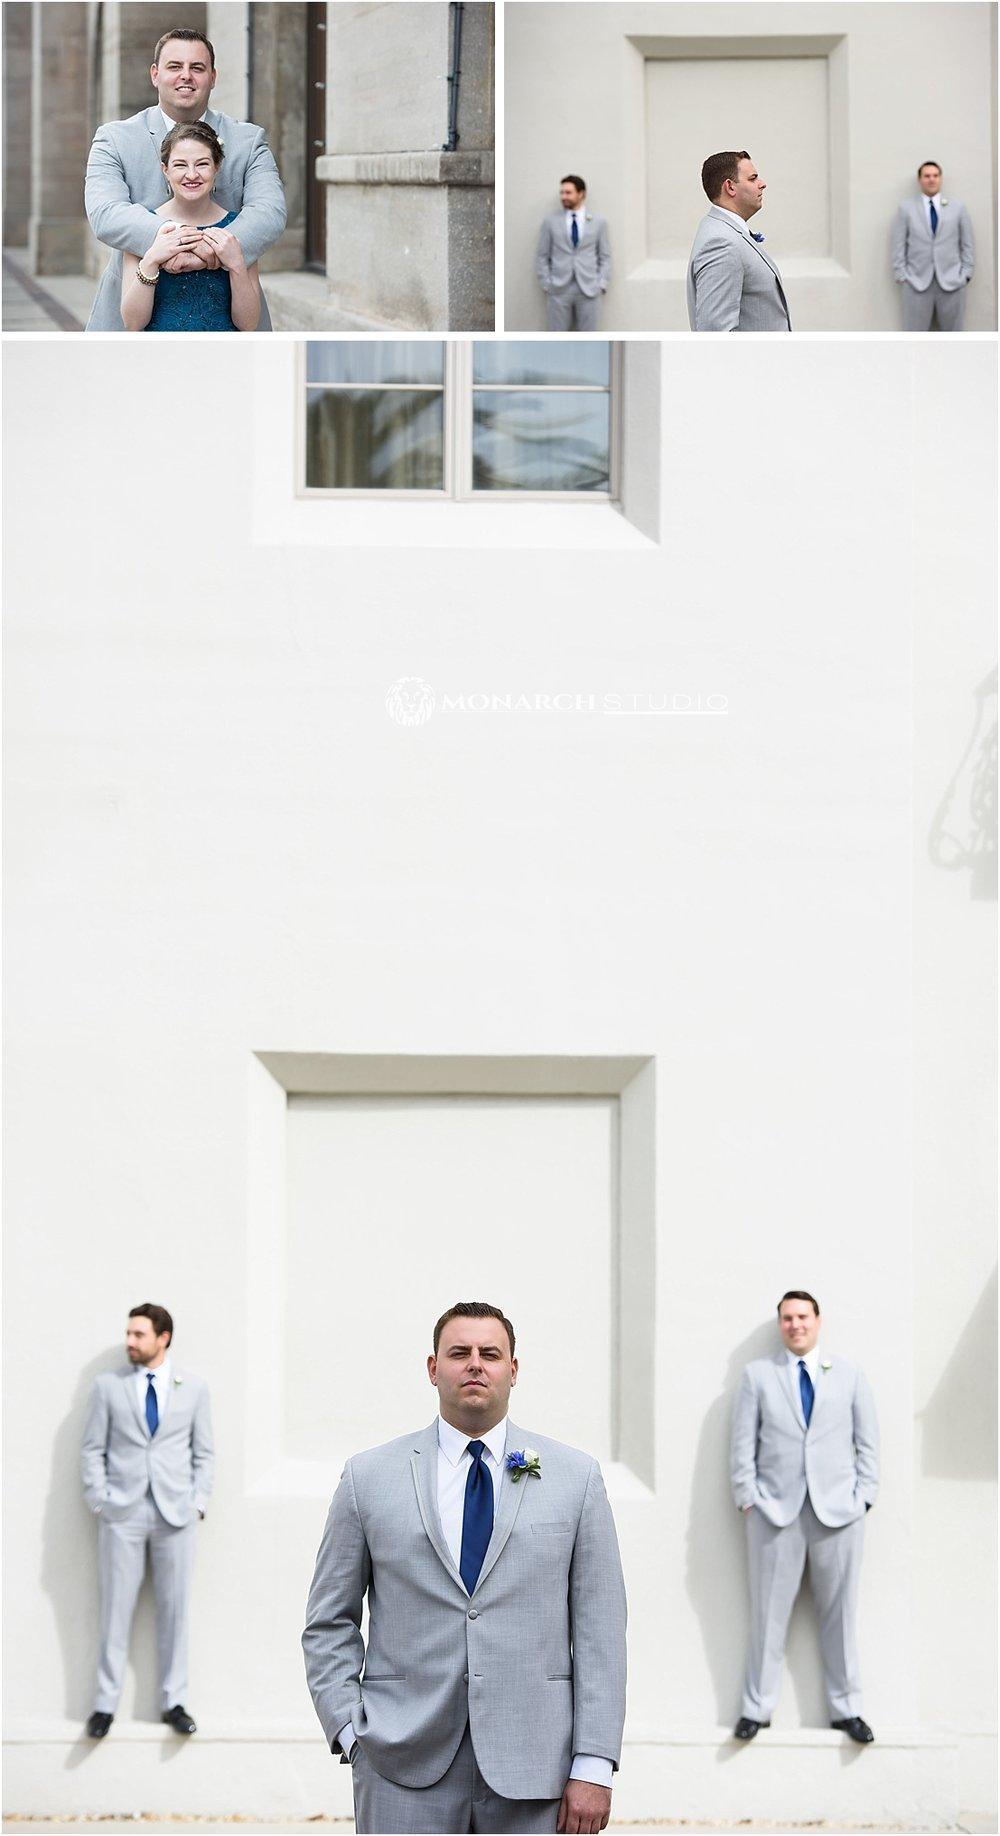 white-room-wedding-photographer-st-augustine-008.jpg